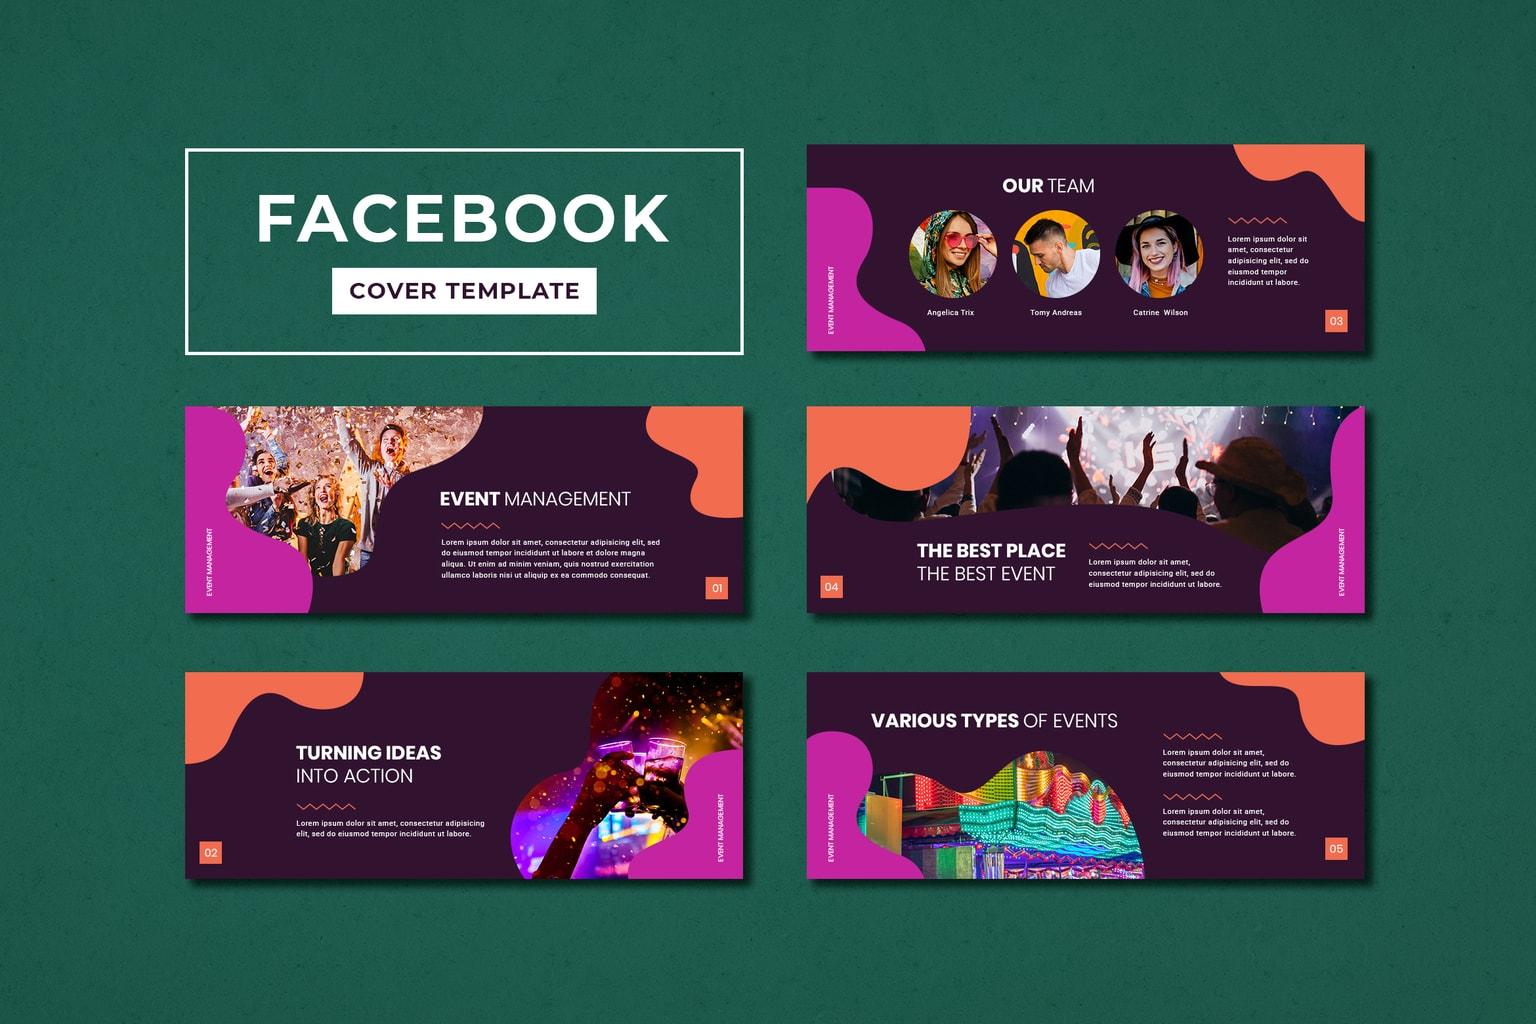 facebook cover event management